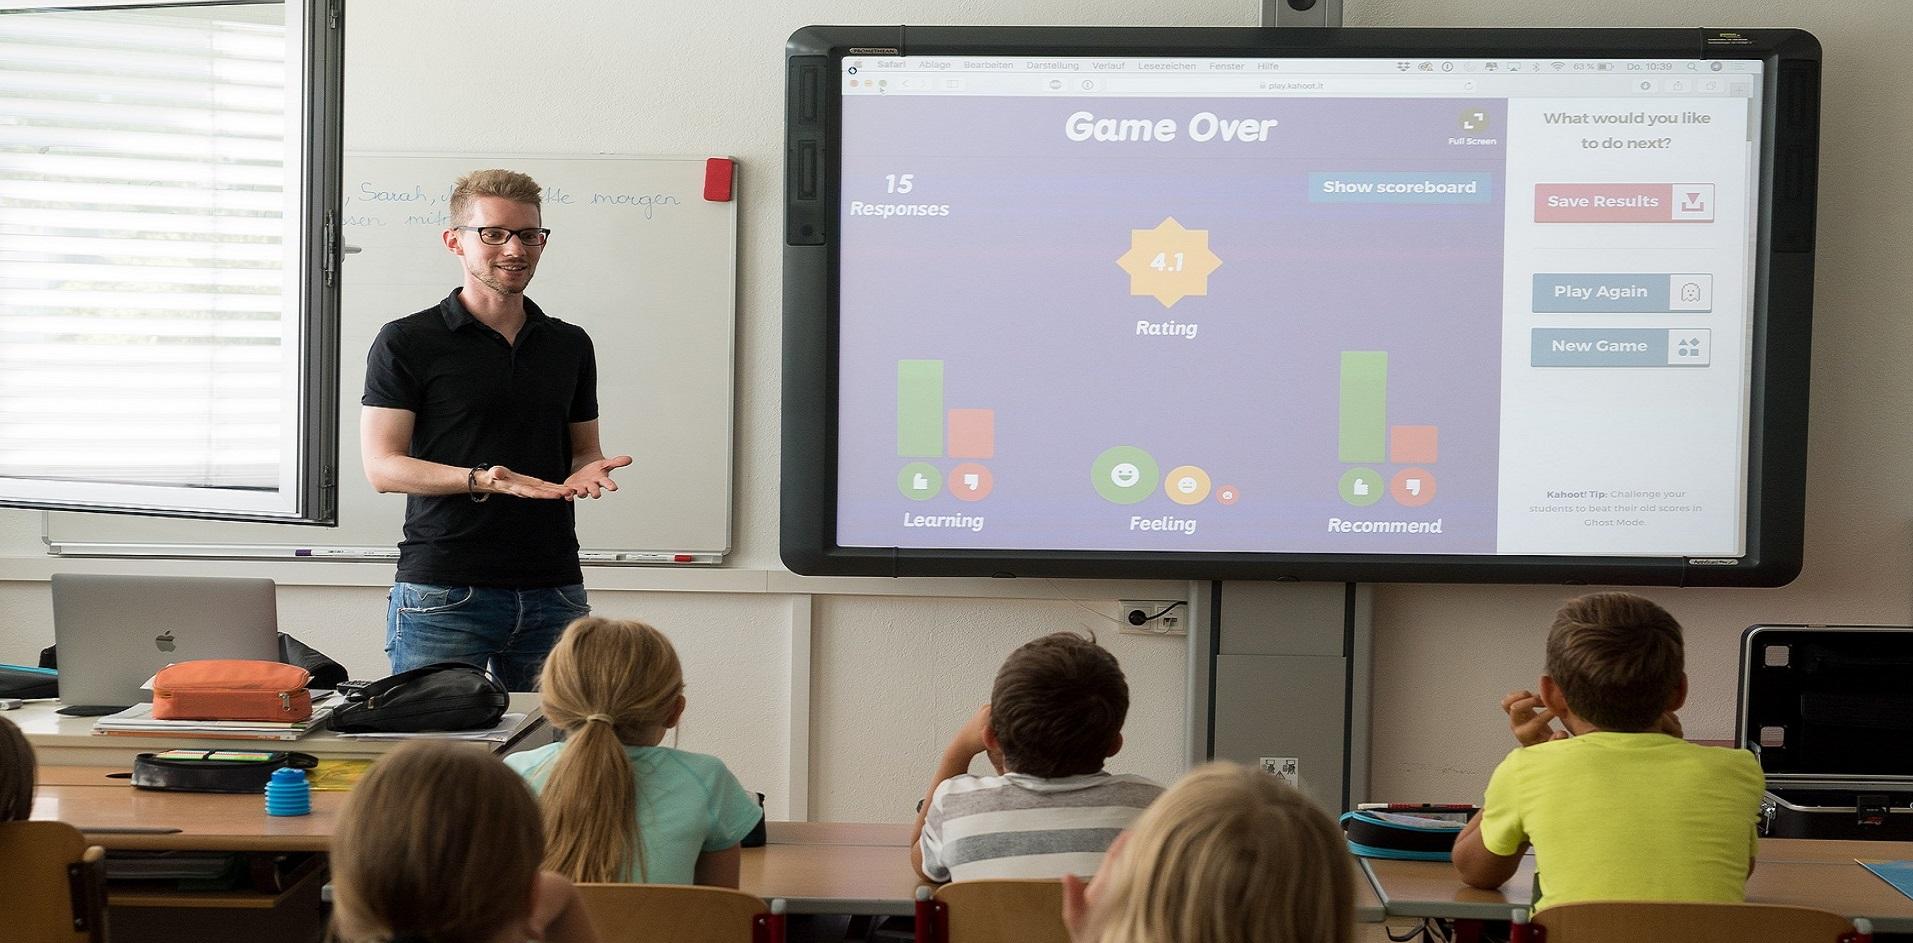 Agcom: scuola digitale, tre problemi